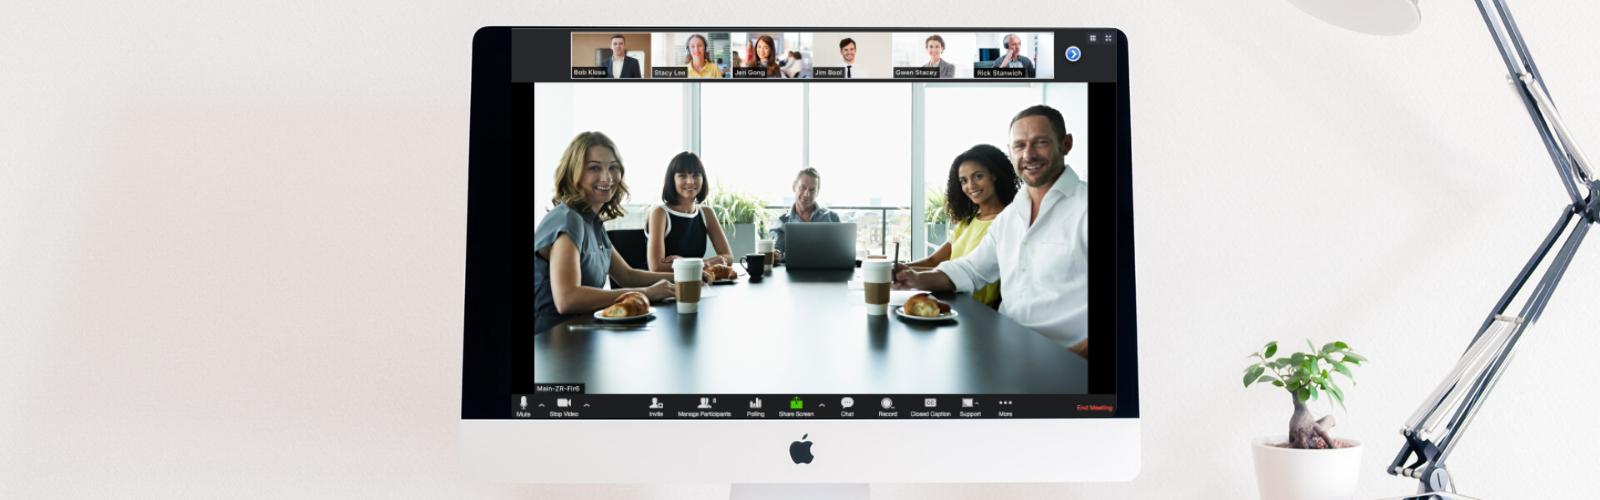 Zoom Meetings leicht gemacht